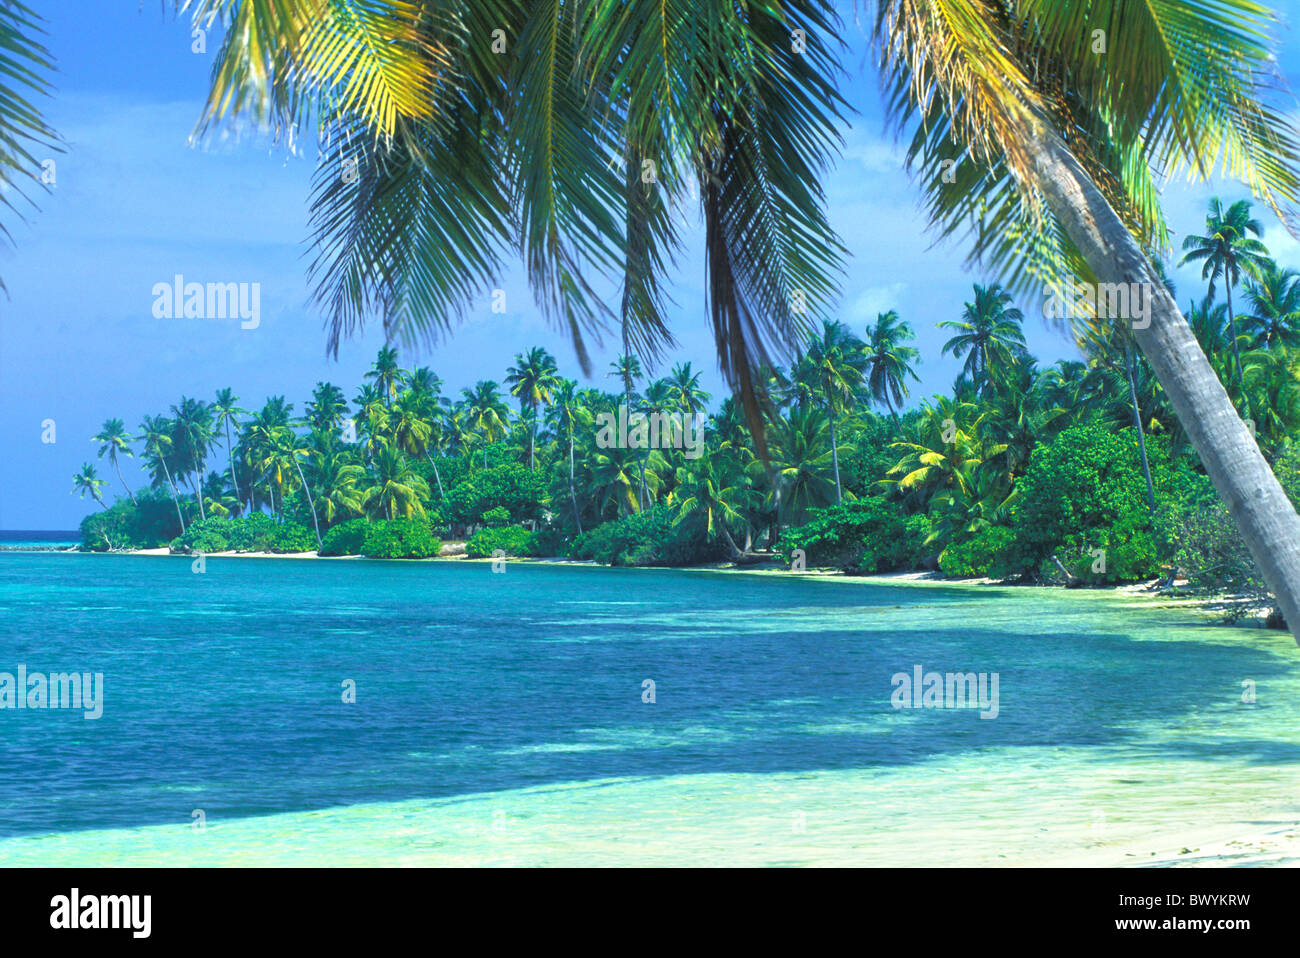 palm beach hindu personals The palm beach daily news, (aka: the shiny sheet) has been serving palm  beach since 1897 covering town of palm beach, south palm beach.